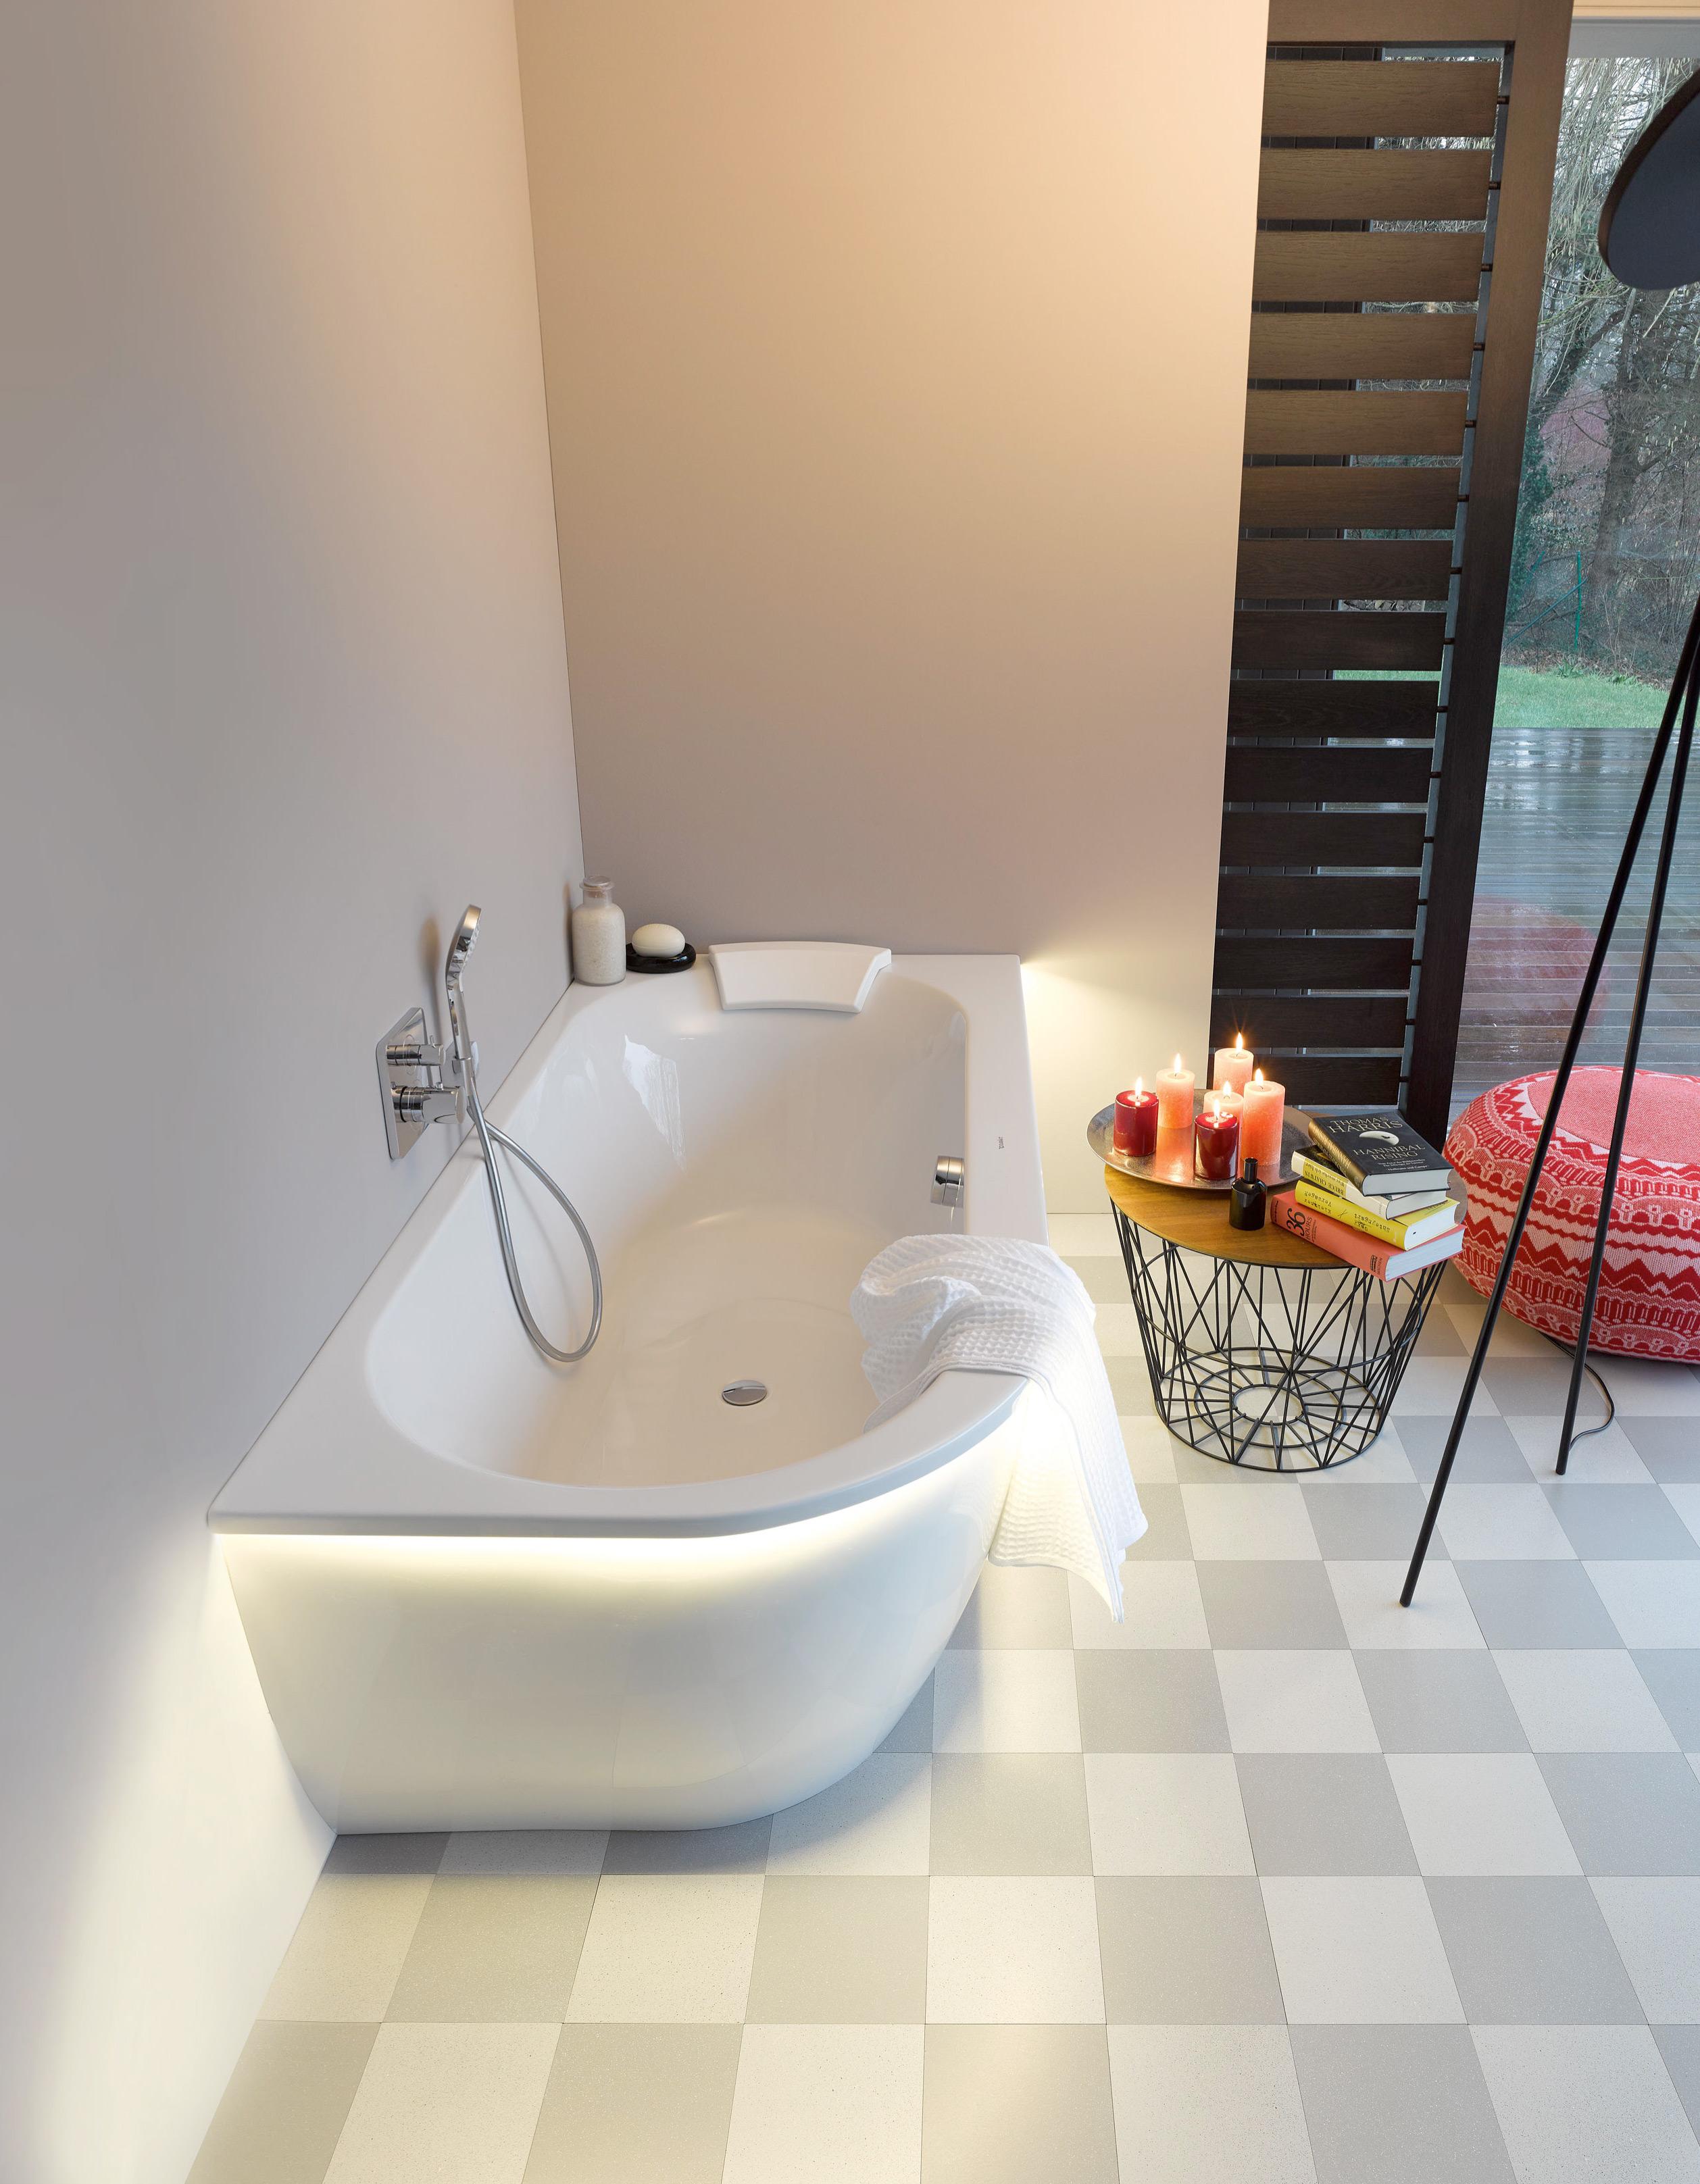 Beautiful Sanitari Duravit Prezzi Images - Reflexdirectory.info ...